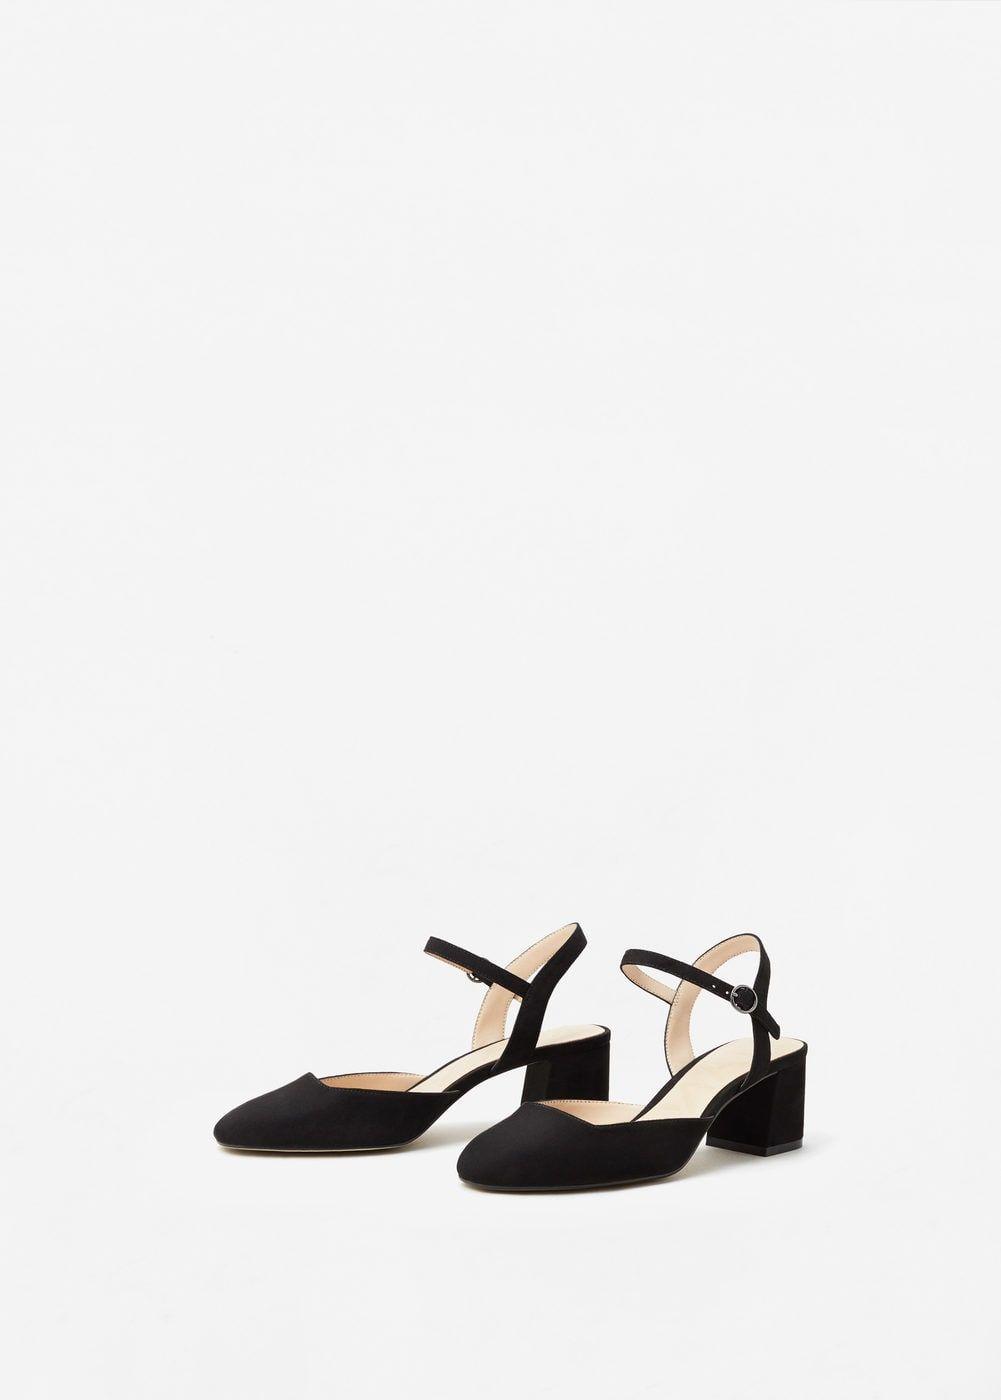 1492d8affe886 Zapato tacón destalonado - Mujer